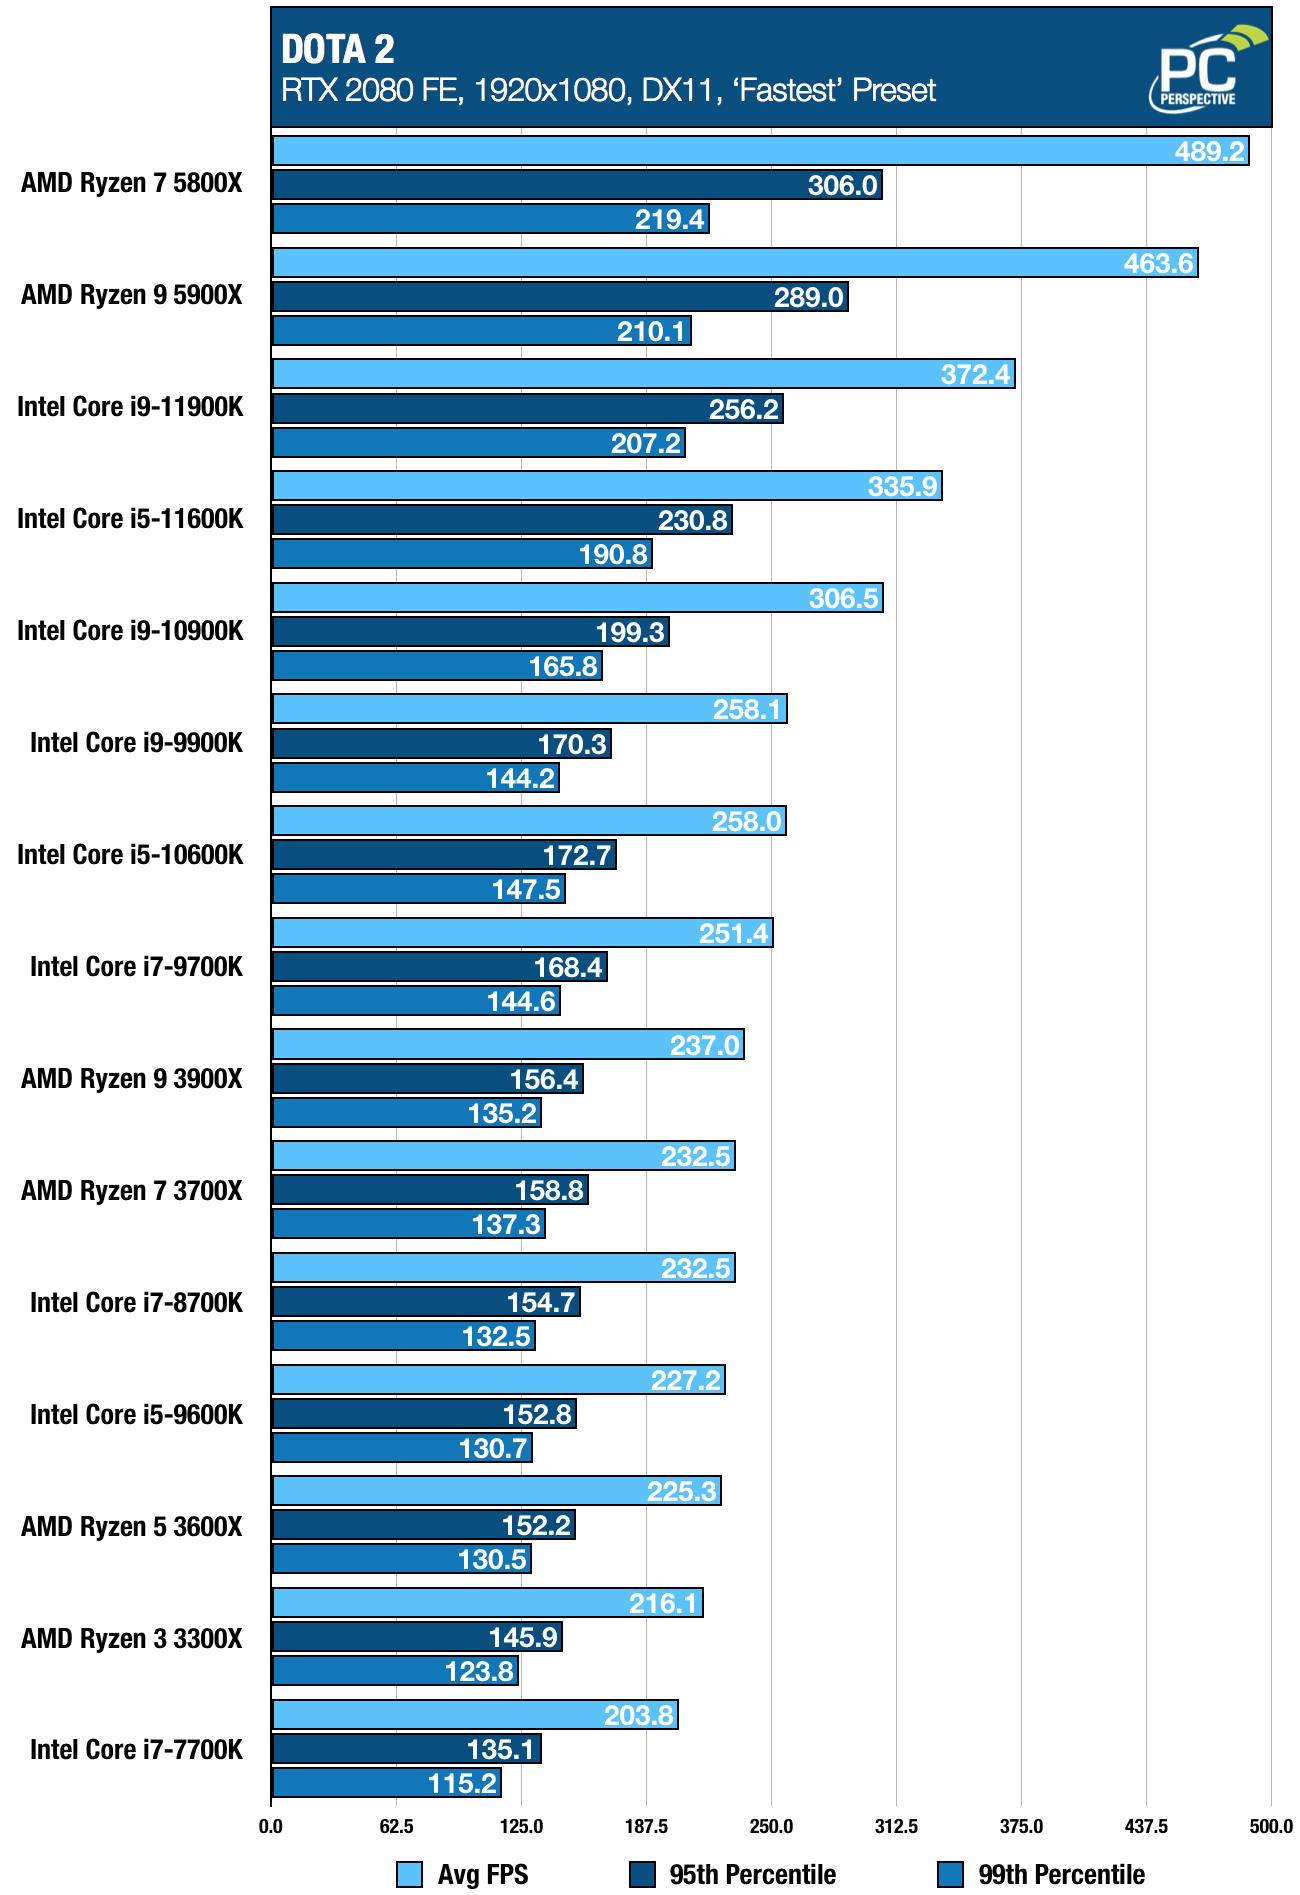 Intel Core i9-11900K i5-11600K DOTA 2 Chart